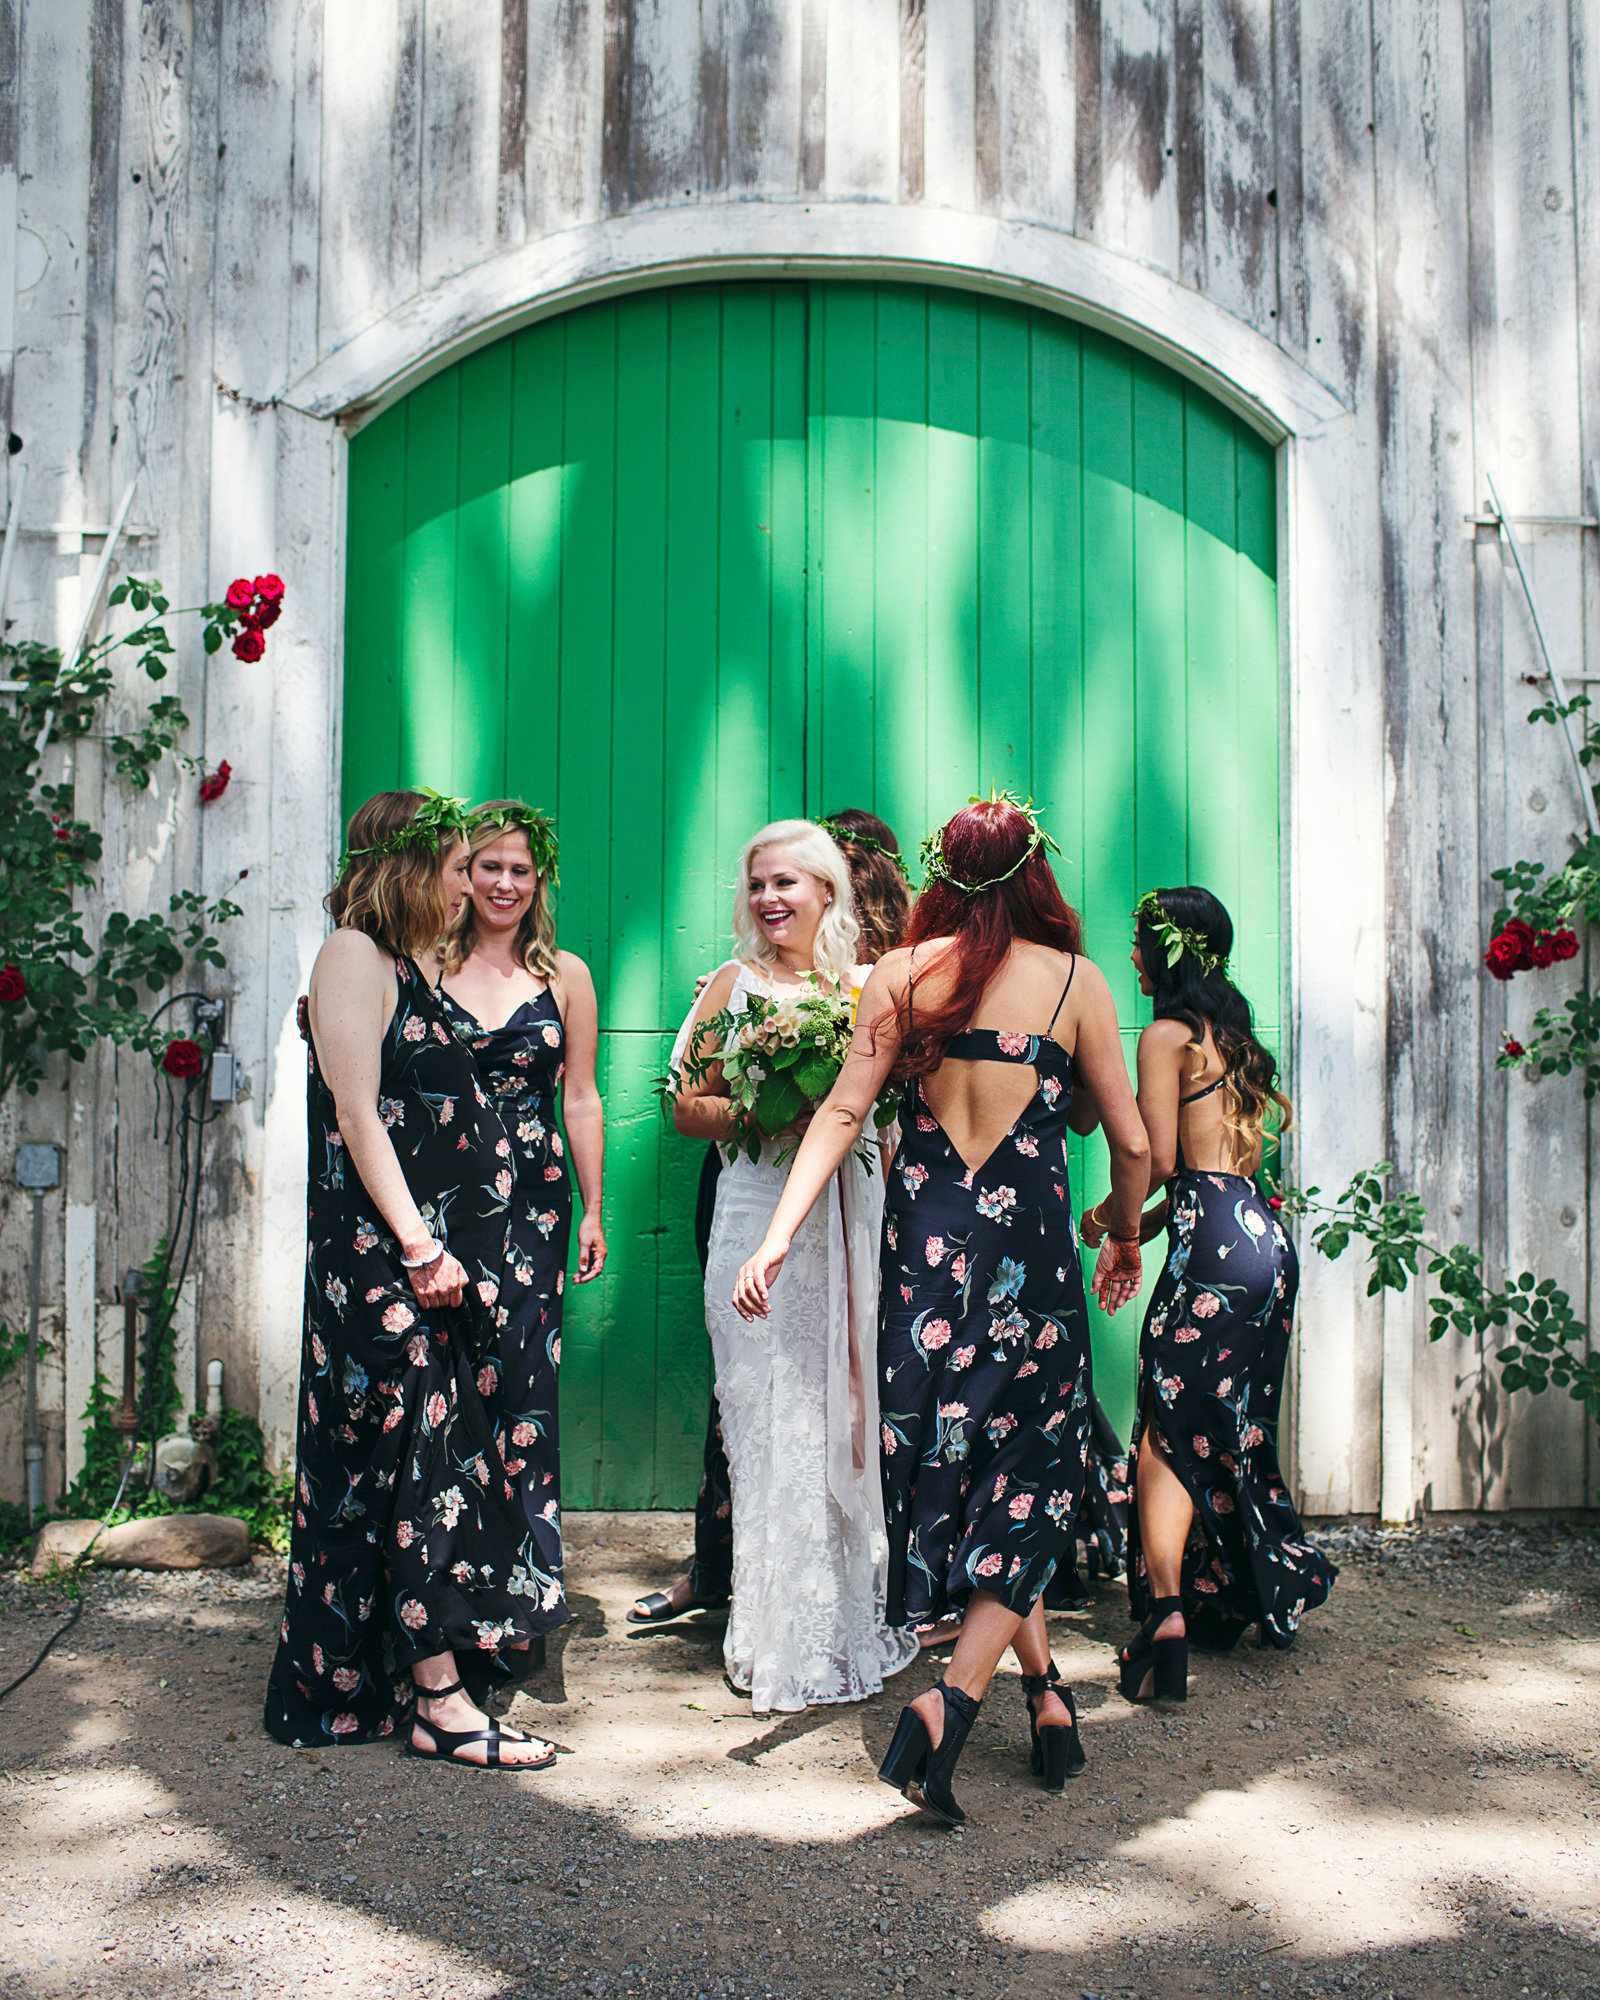 rosie-ambi-wedding-bridesmaids-3051-s112501-0116.jpg